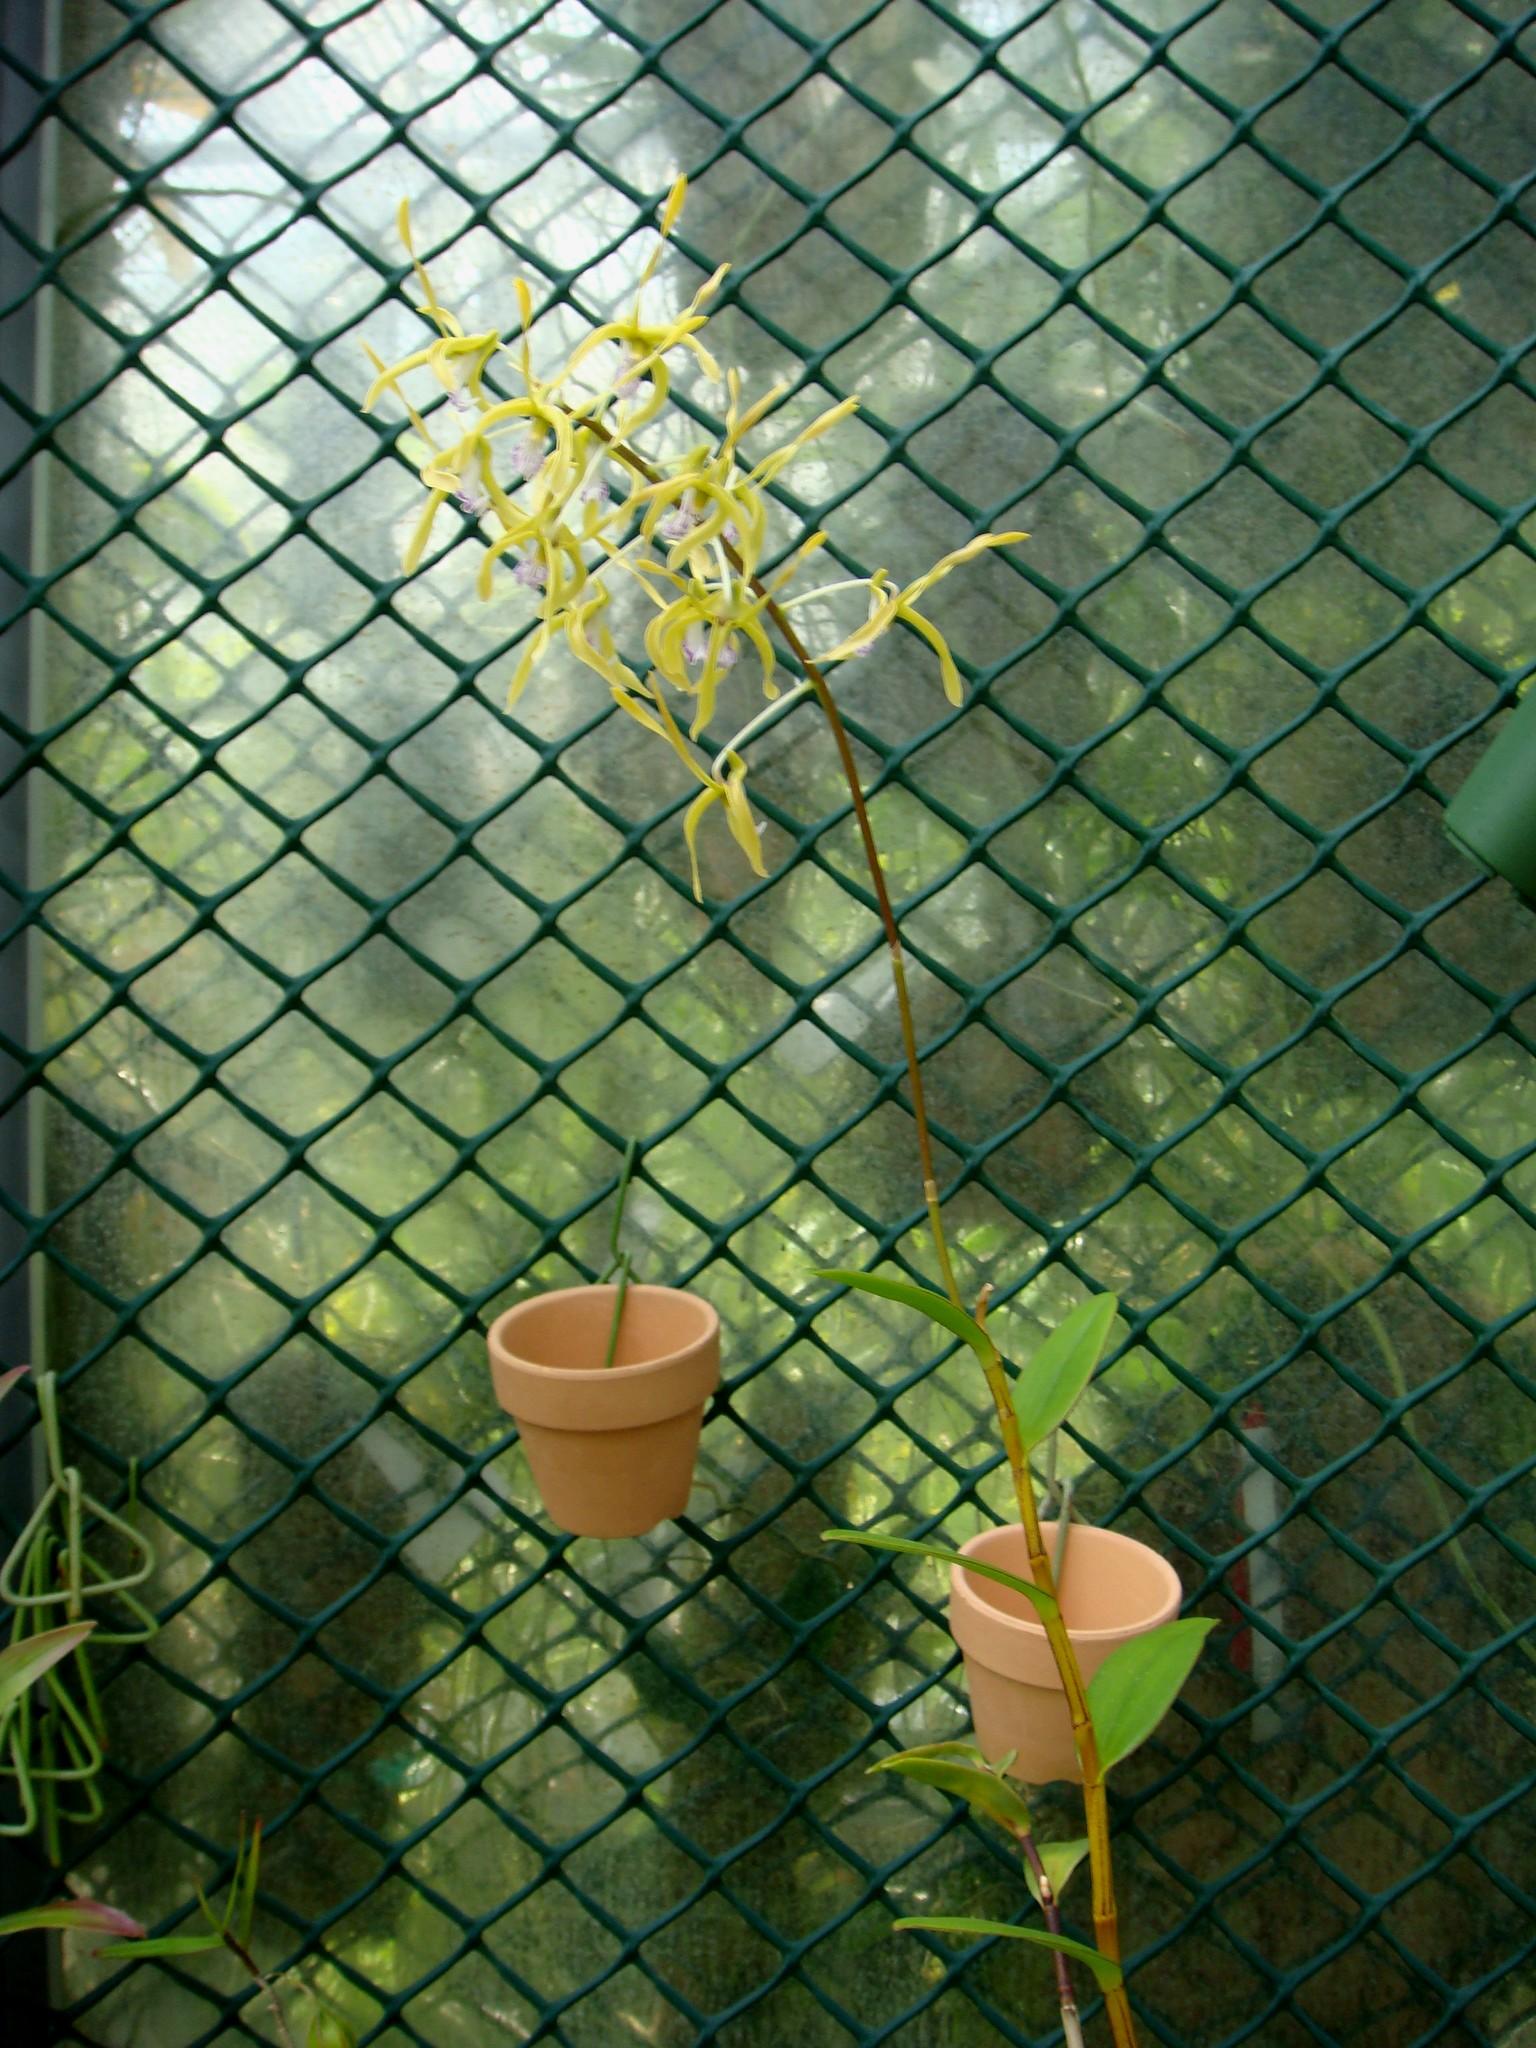 http://orchids.la.coocan.jp/Dendrobium/Dendrobium%20hamiferum/DSC09732.JPG